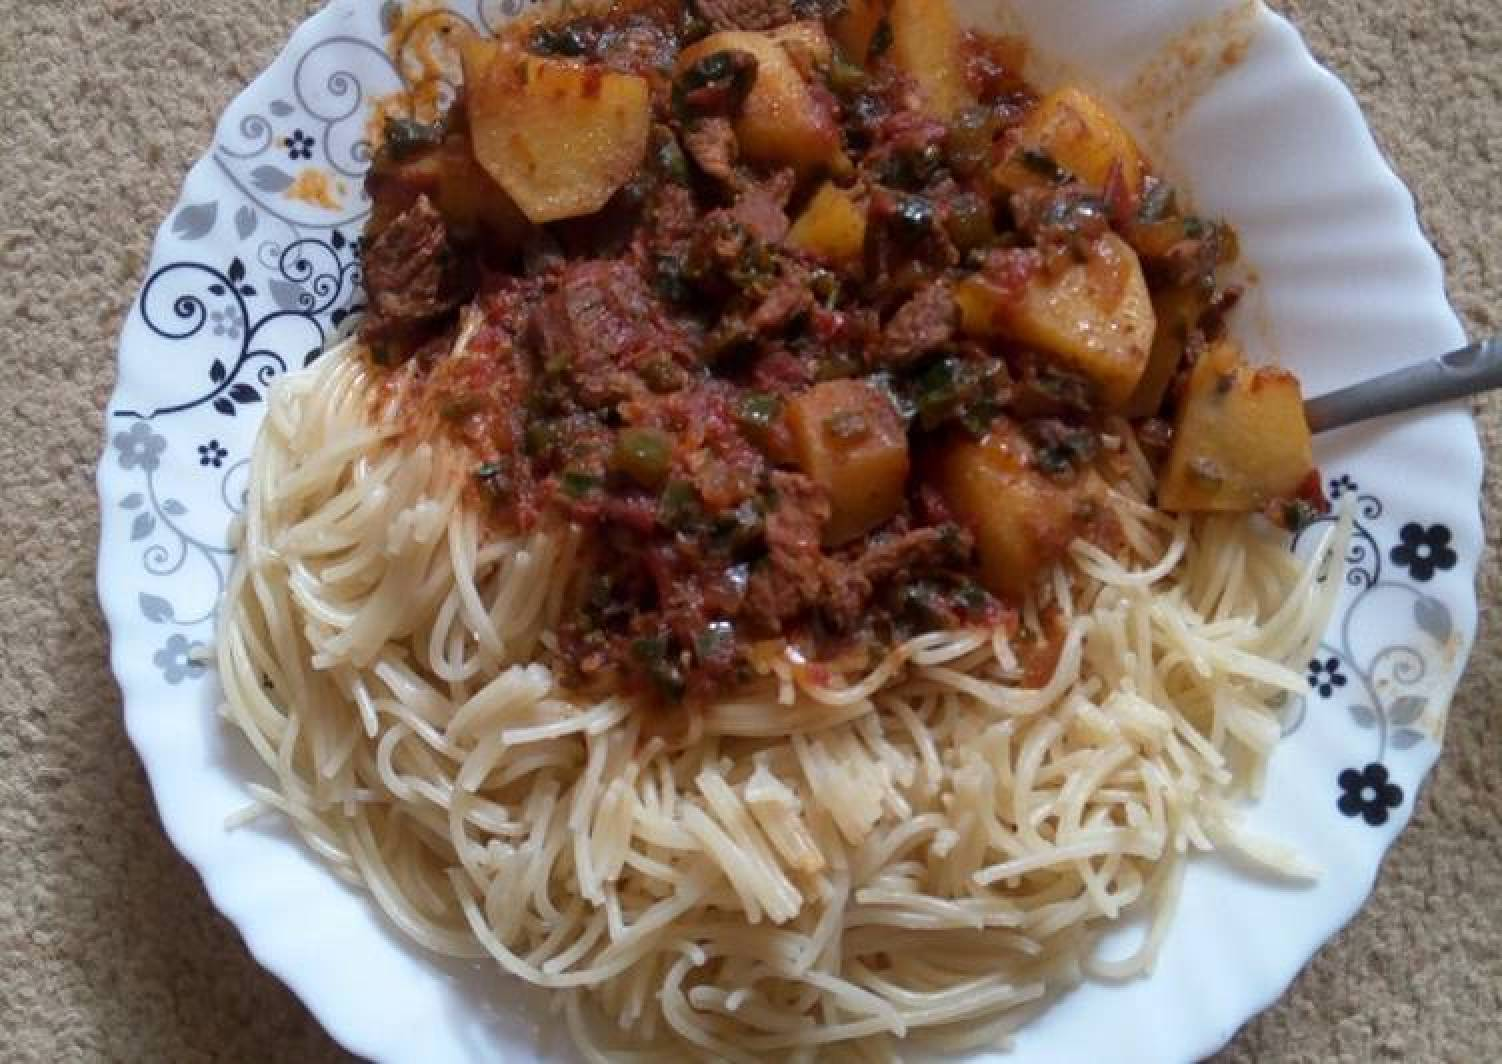 Spaghetti and beef stew